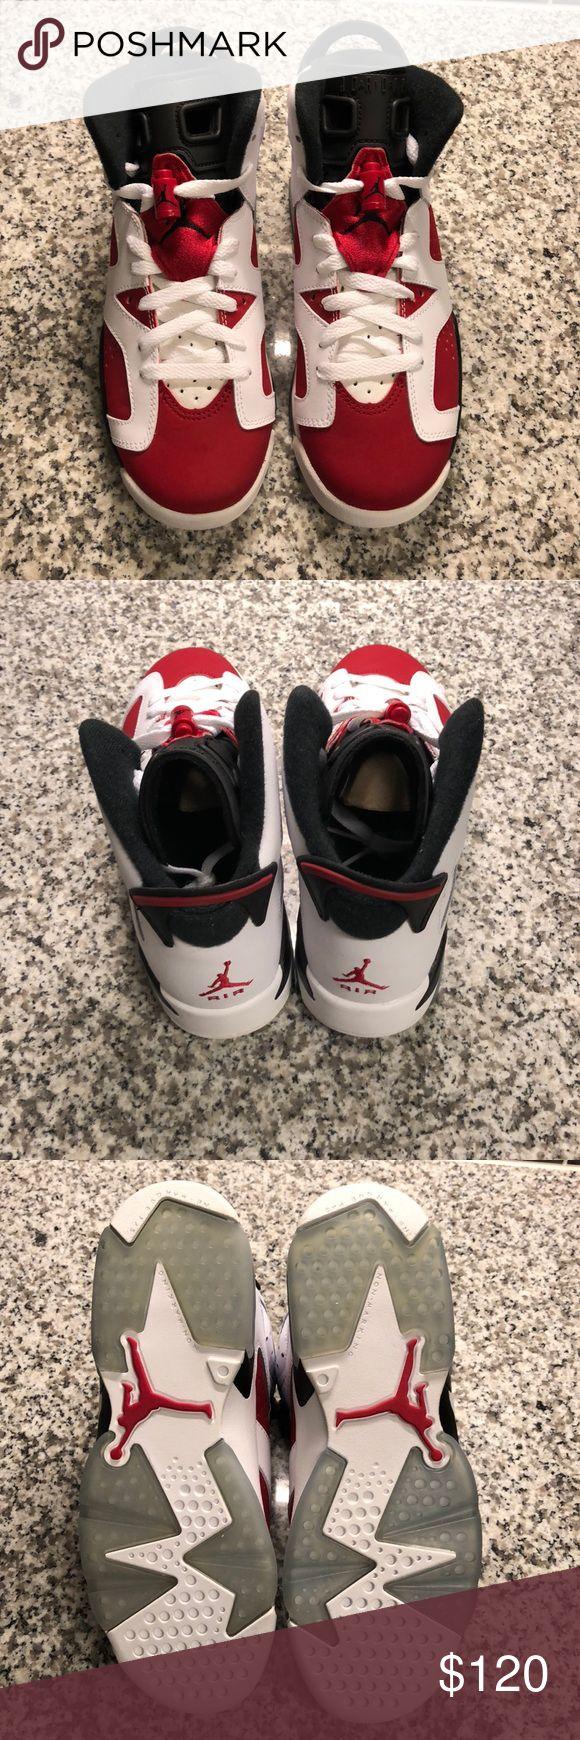 "Air Jordan Retro 6 ""Carmine"" 2014 Release Authentic Retro 6 Air Jordan's. Never worn. This is a 5.5 in kids or a 7 in women's Air Jordan Shoes Sneakers"